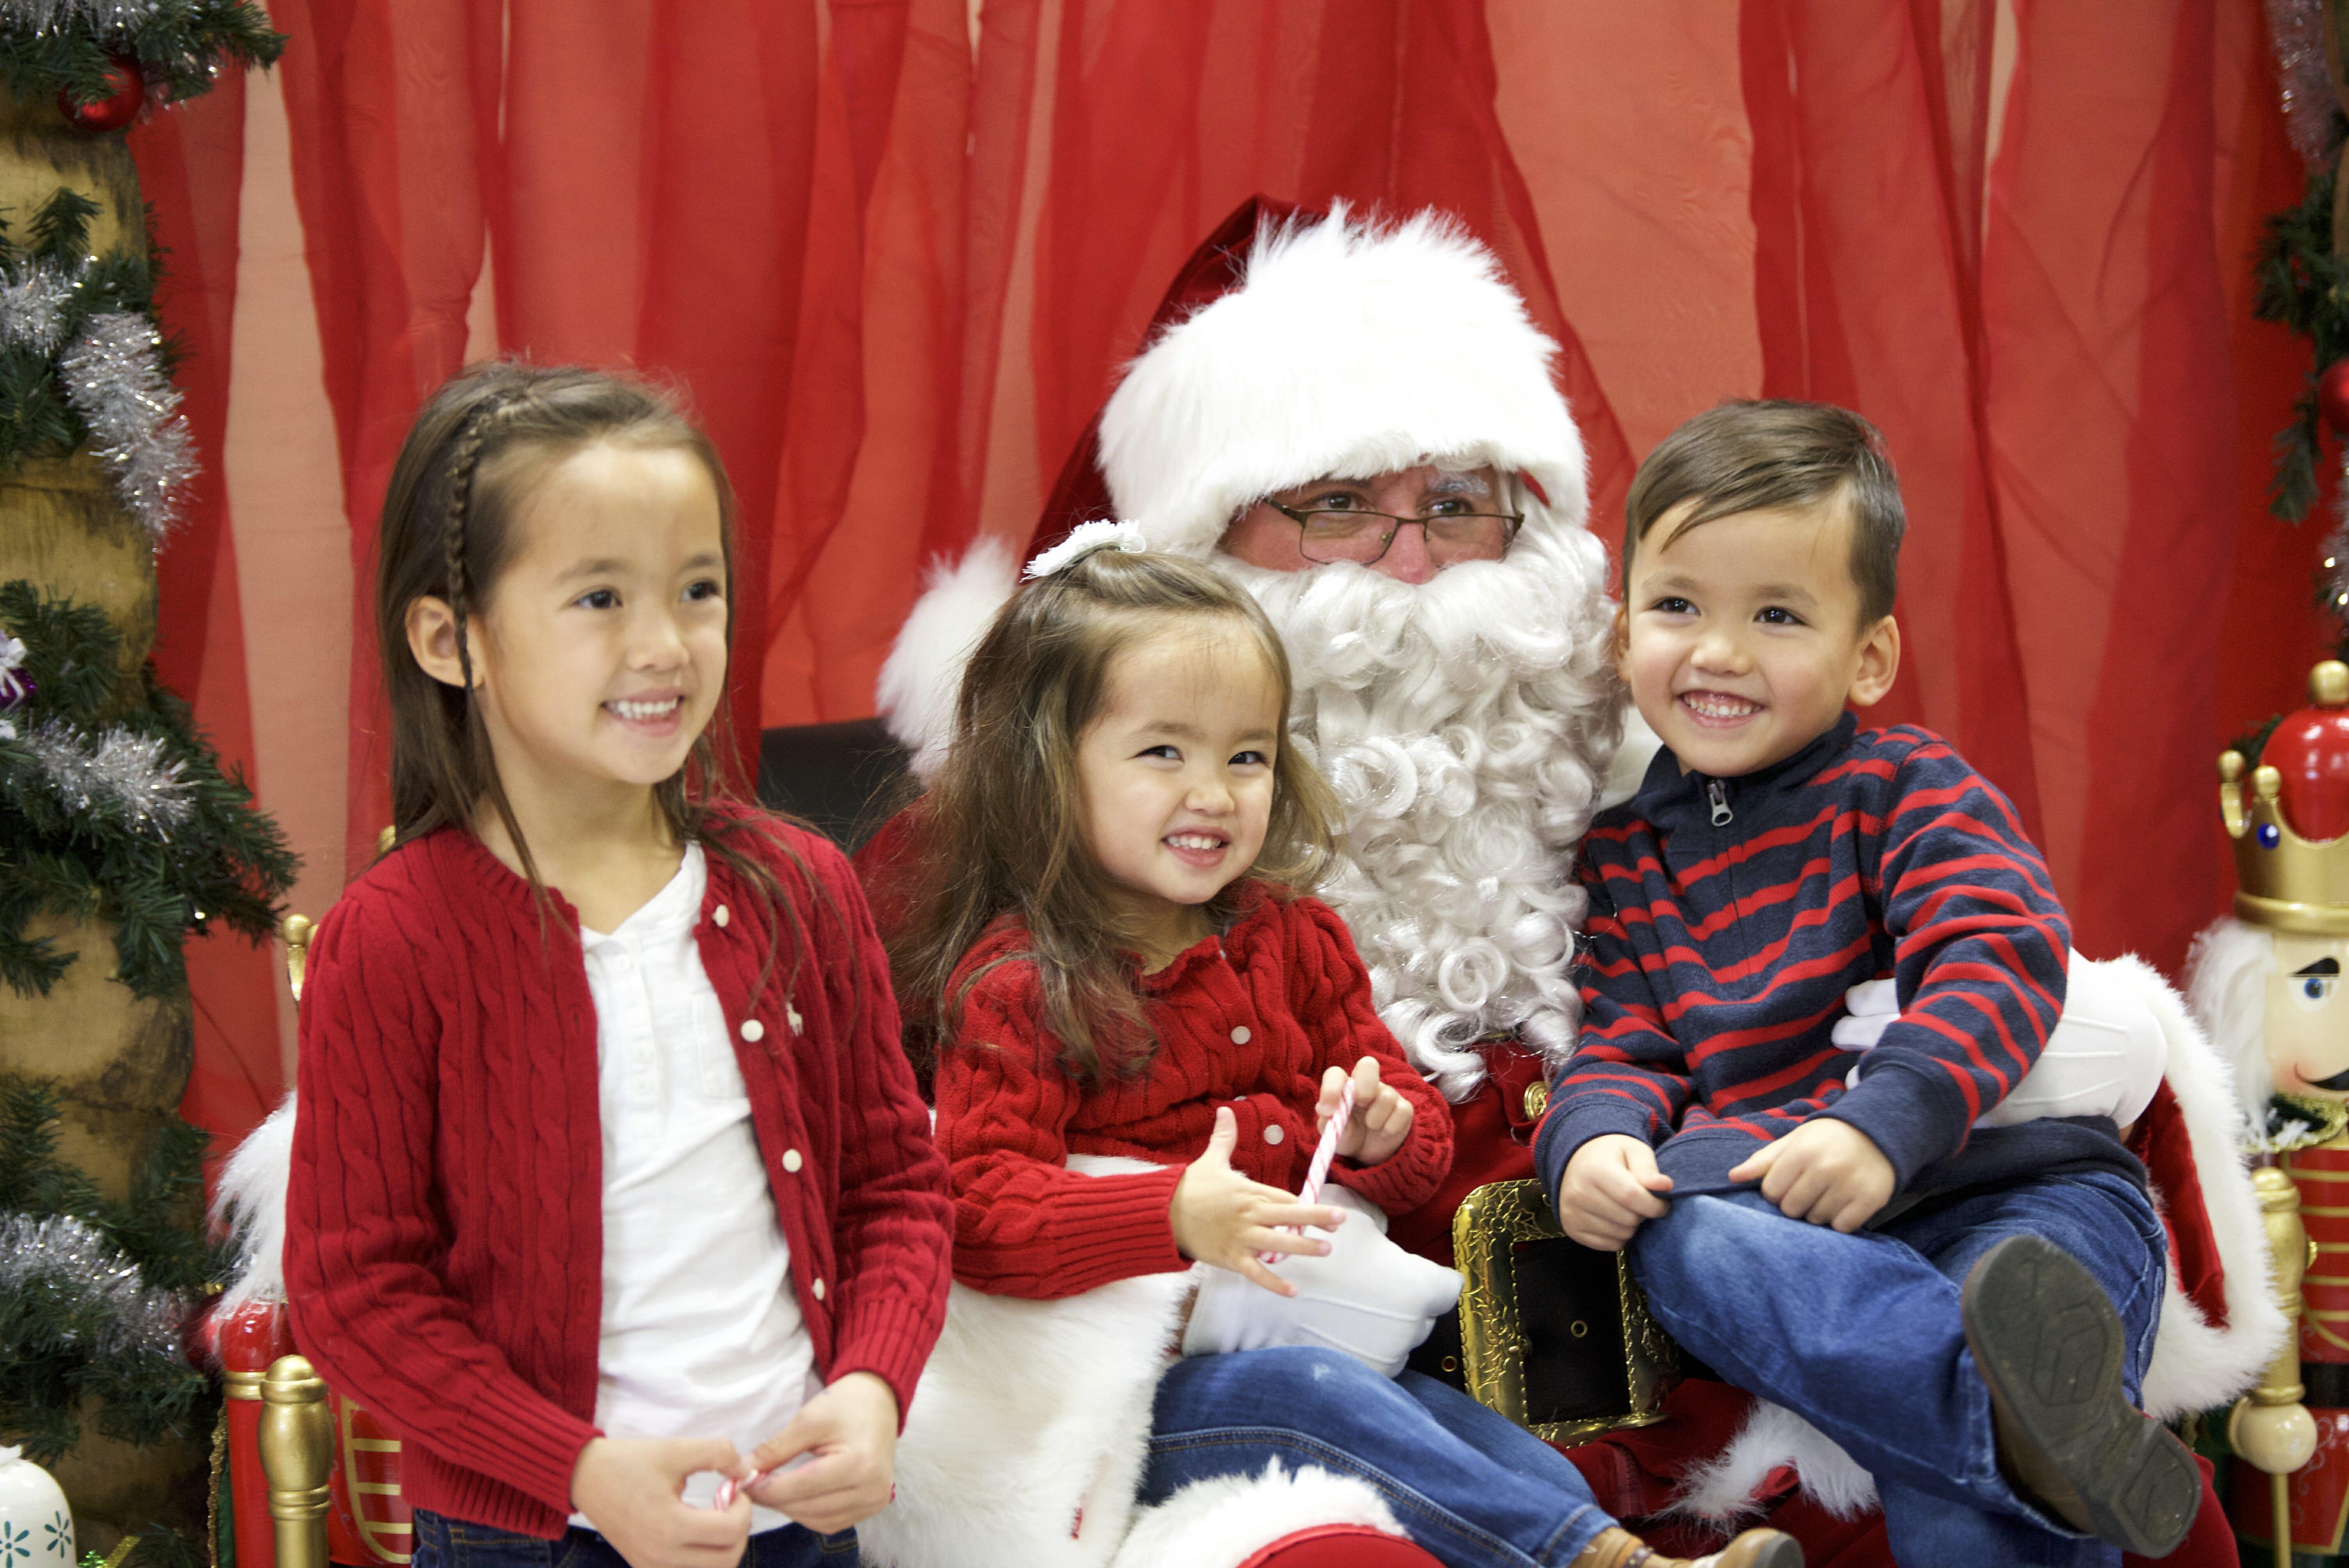 Powell Christmas Parade 2020 City of Powell, Ohio | Holidays in Powell